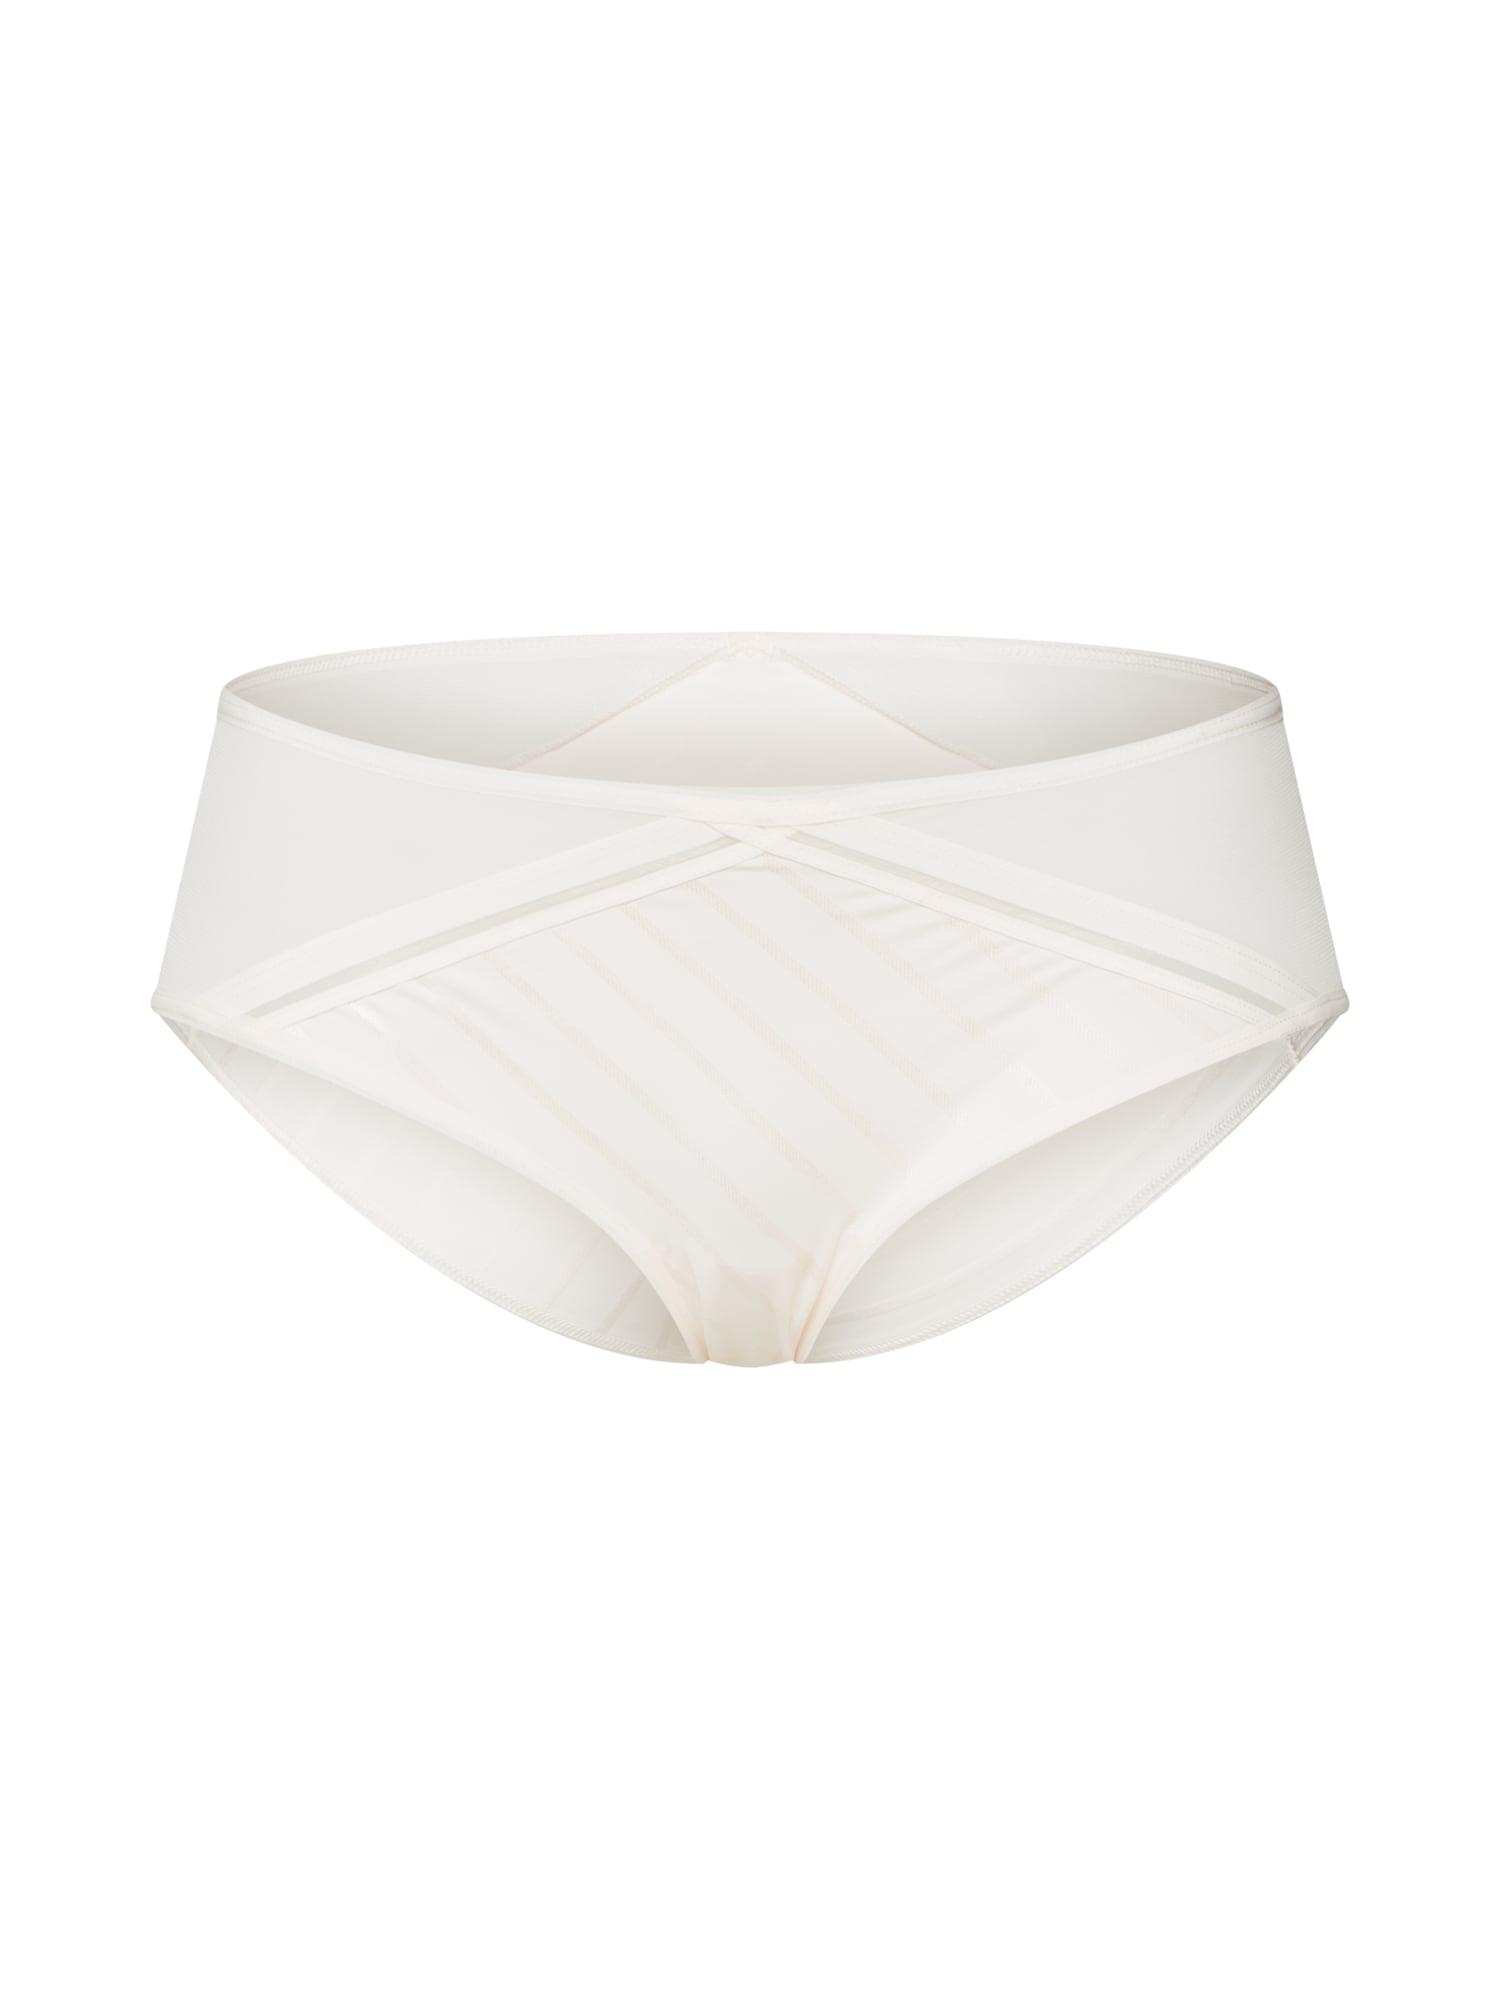 Kalhotky GRAPHIC krémová PASSIONATA